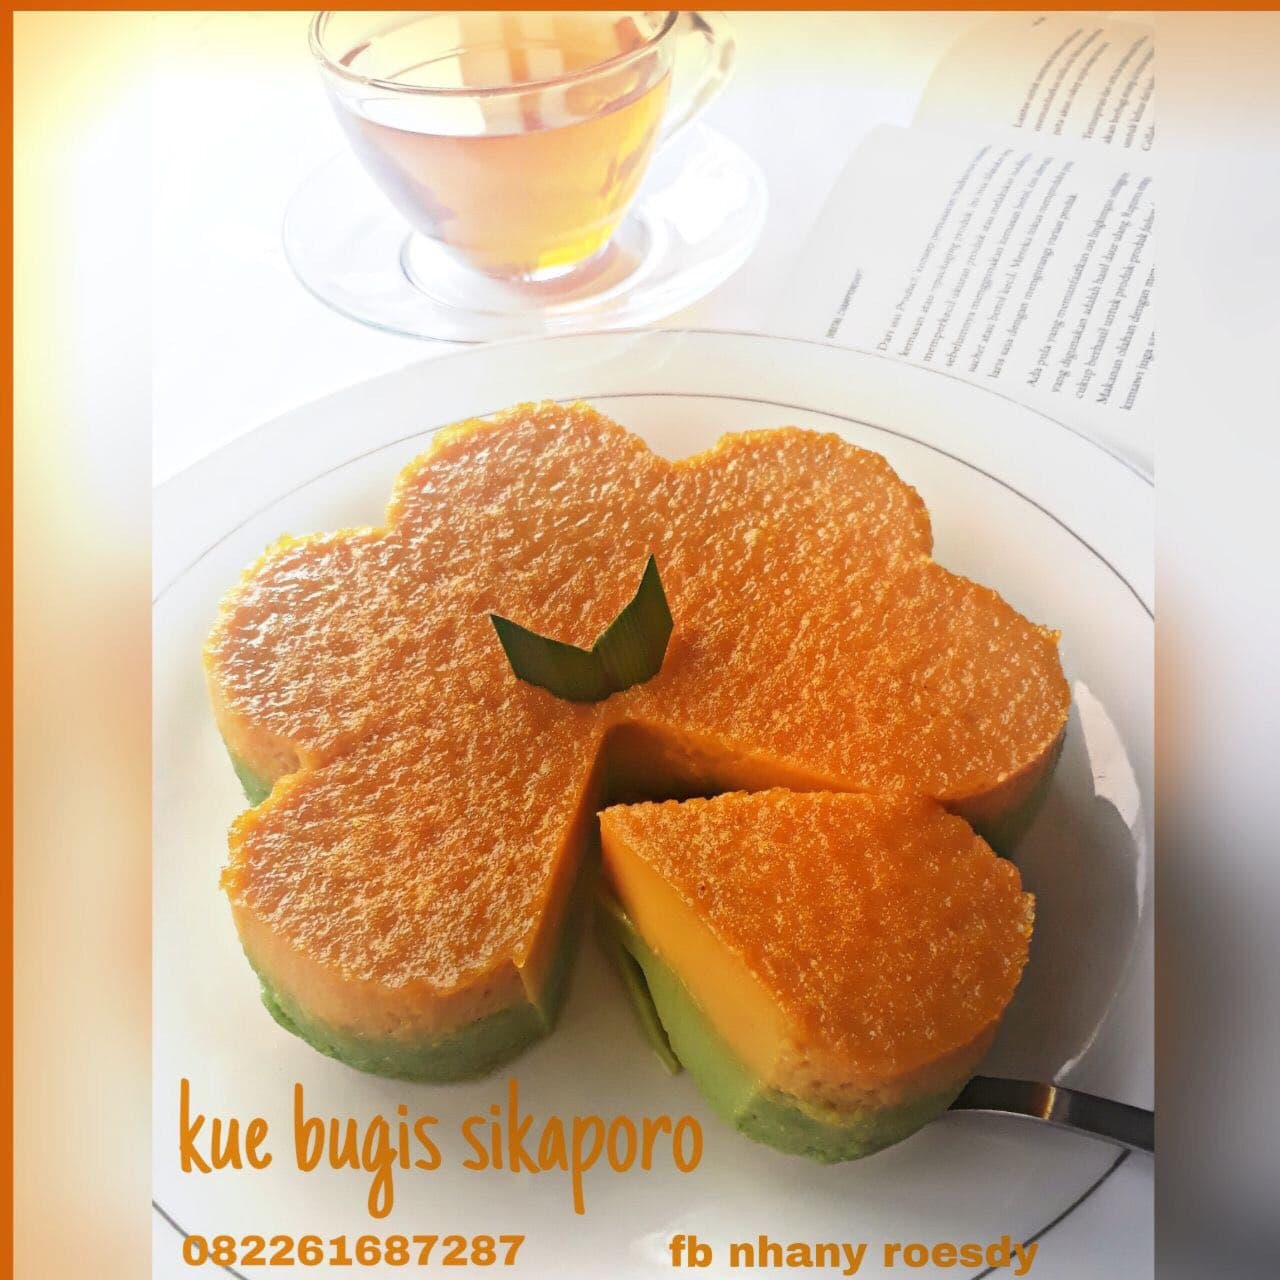 Jual Produk Ukm Bumn Kue Bugis Sk Batik Ngremboko